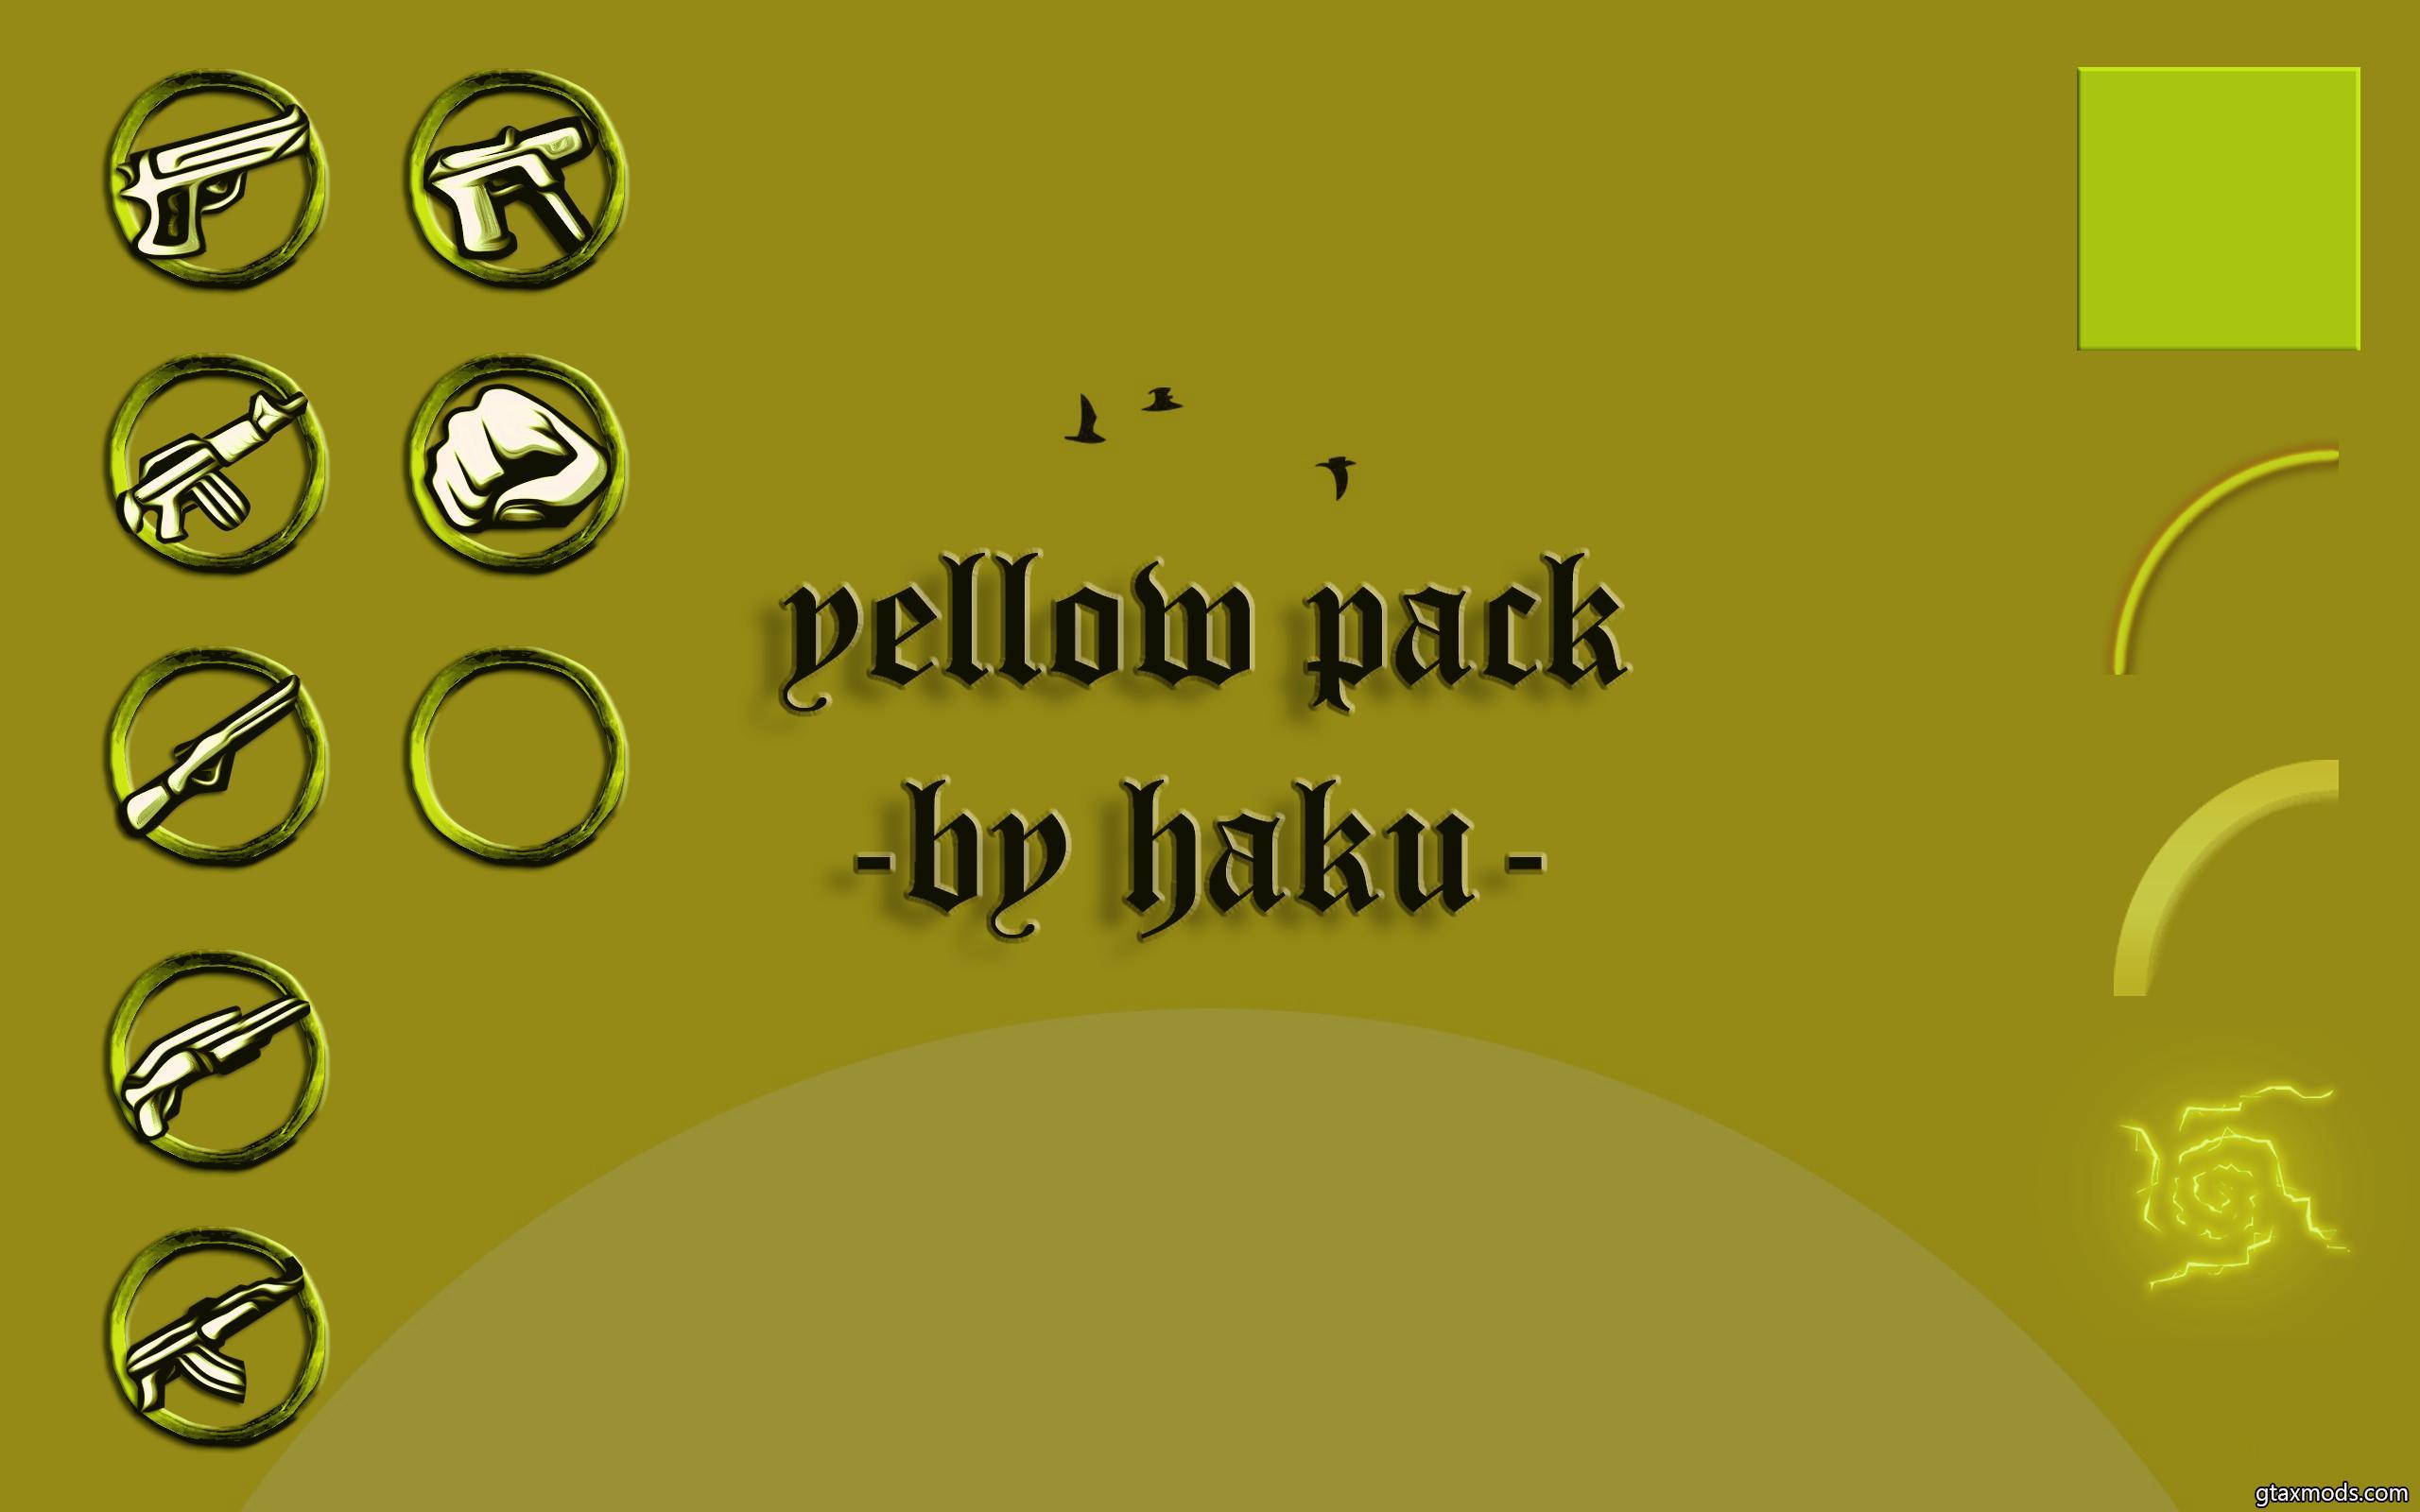 YELLOW PACK BY HAKU V1